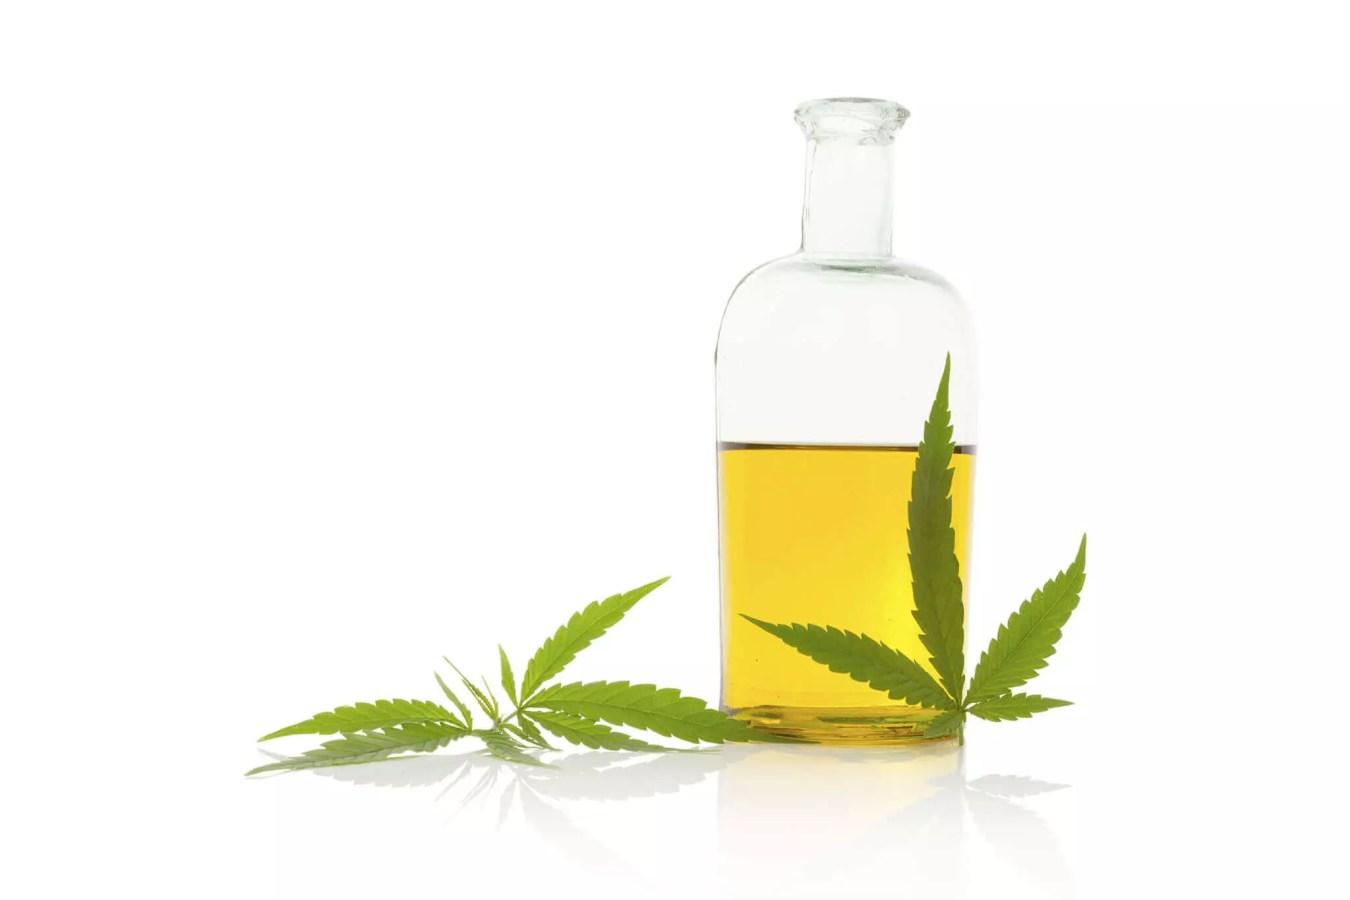 oil and hemp plant